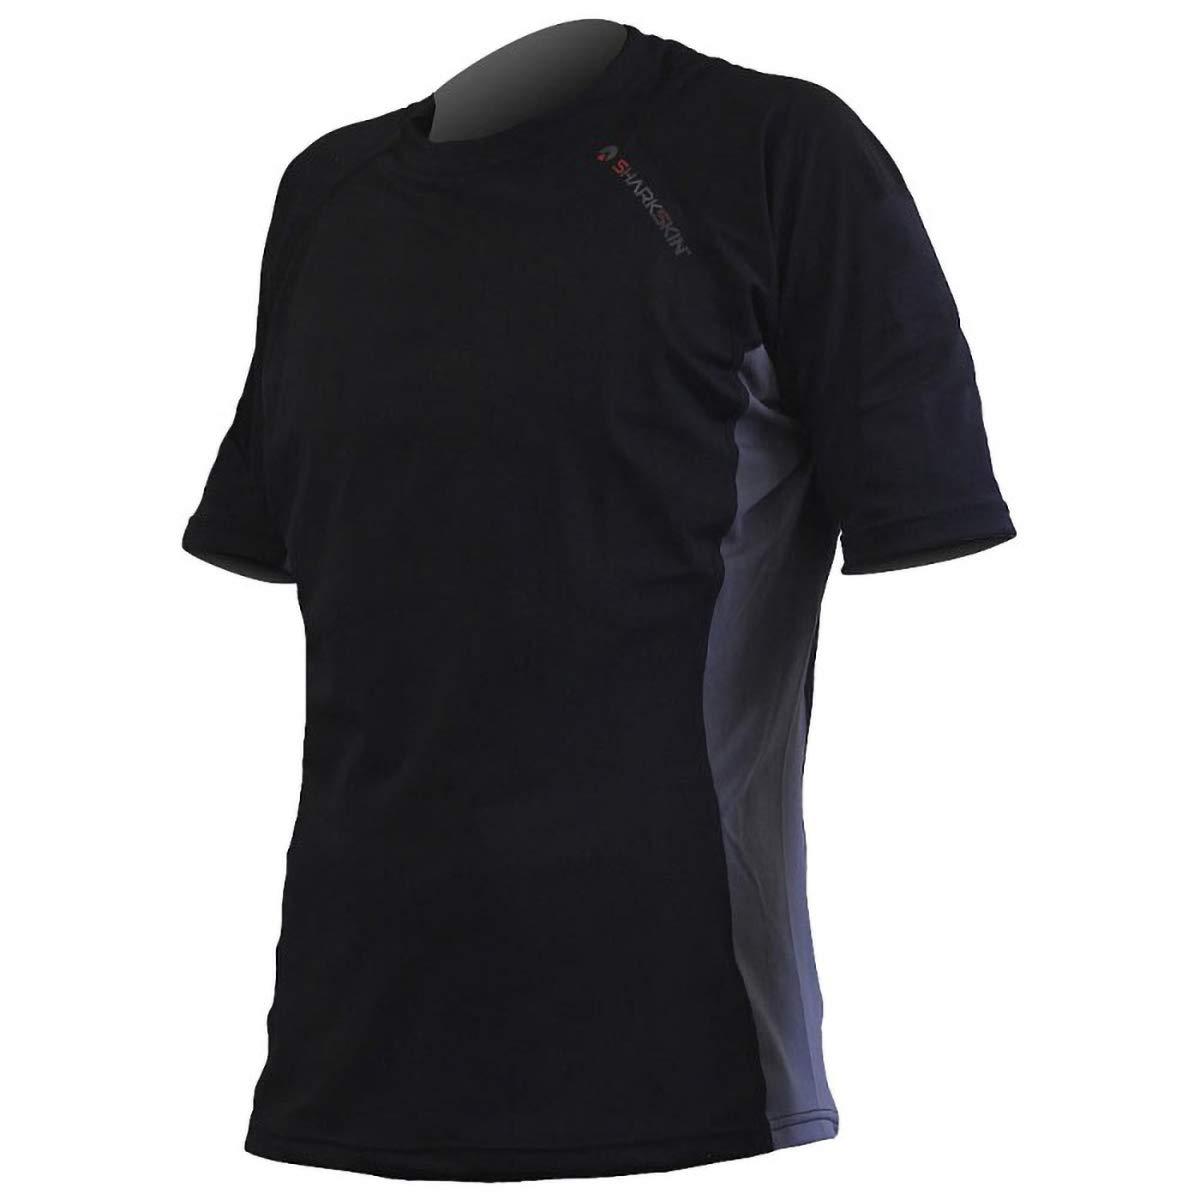 Sharkskin Rapid Dry Short Sleeve Shirt, Black, 3X-Large by Sharkskin